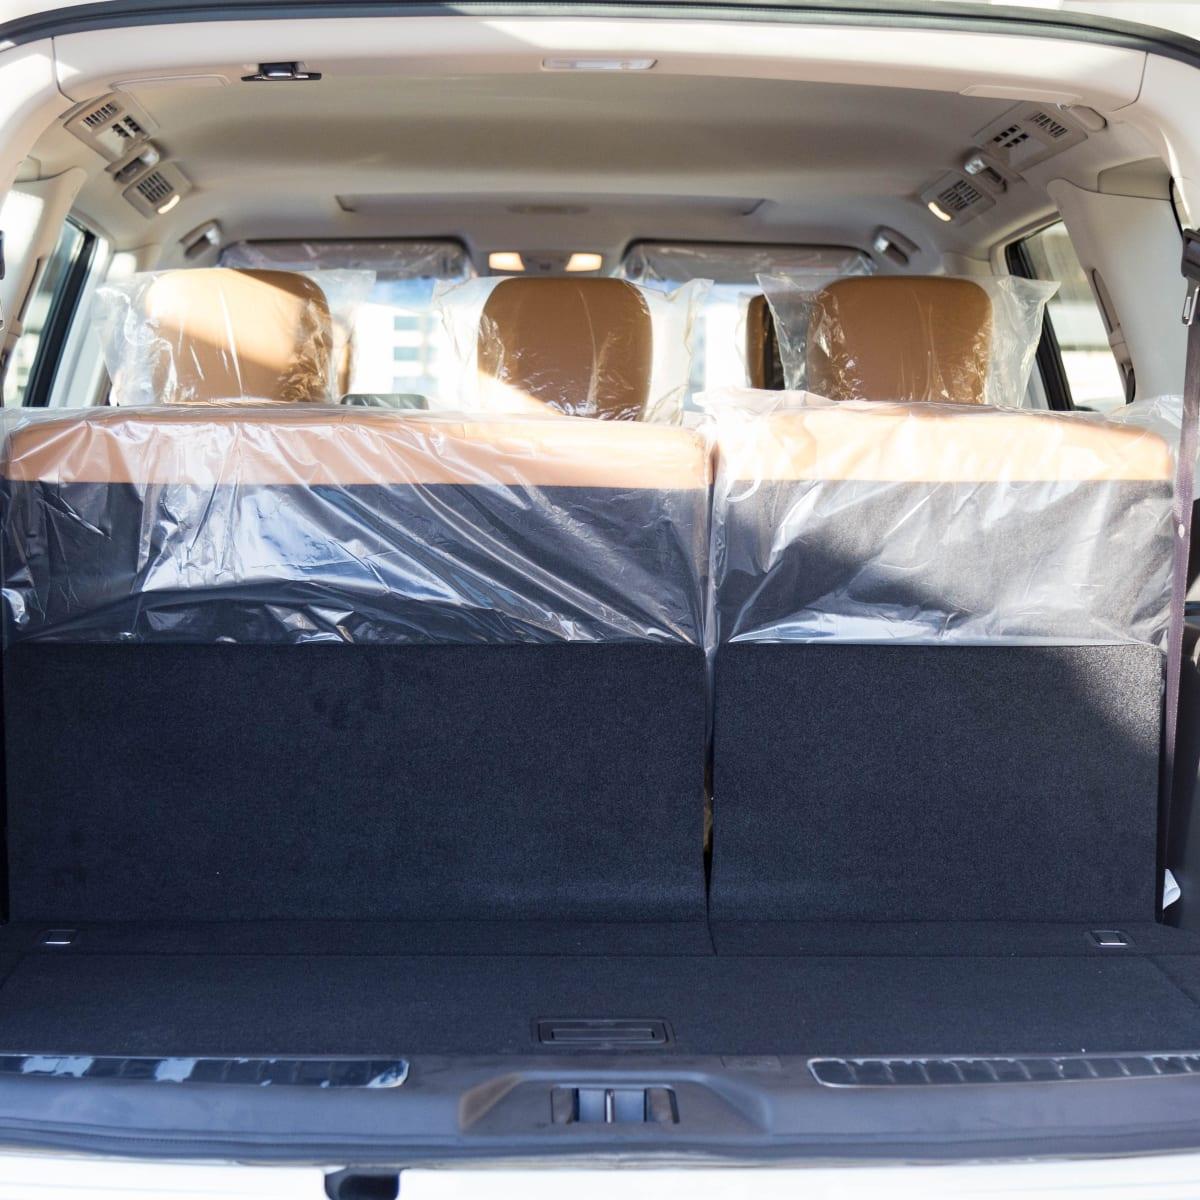 2018 Nissan Patrol Le Titanium 5.6L full